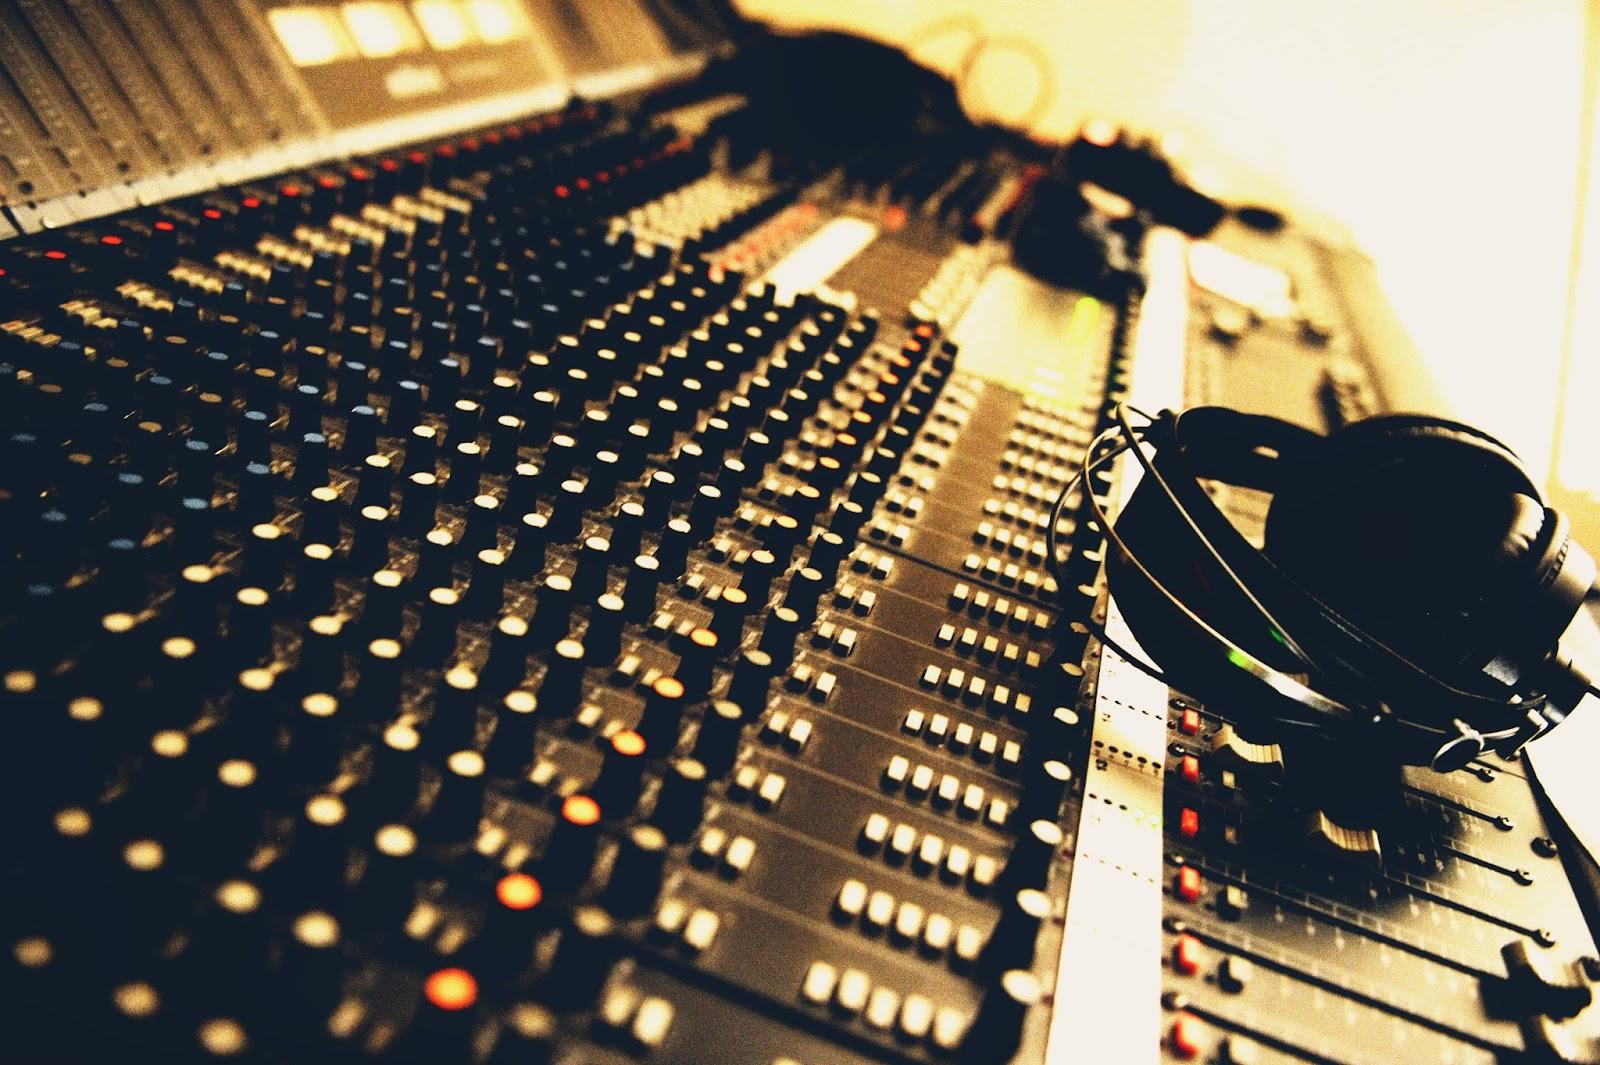 Les eyquems - Table de mixage studio d enregistrement ...